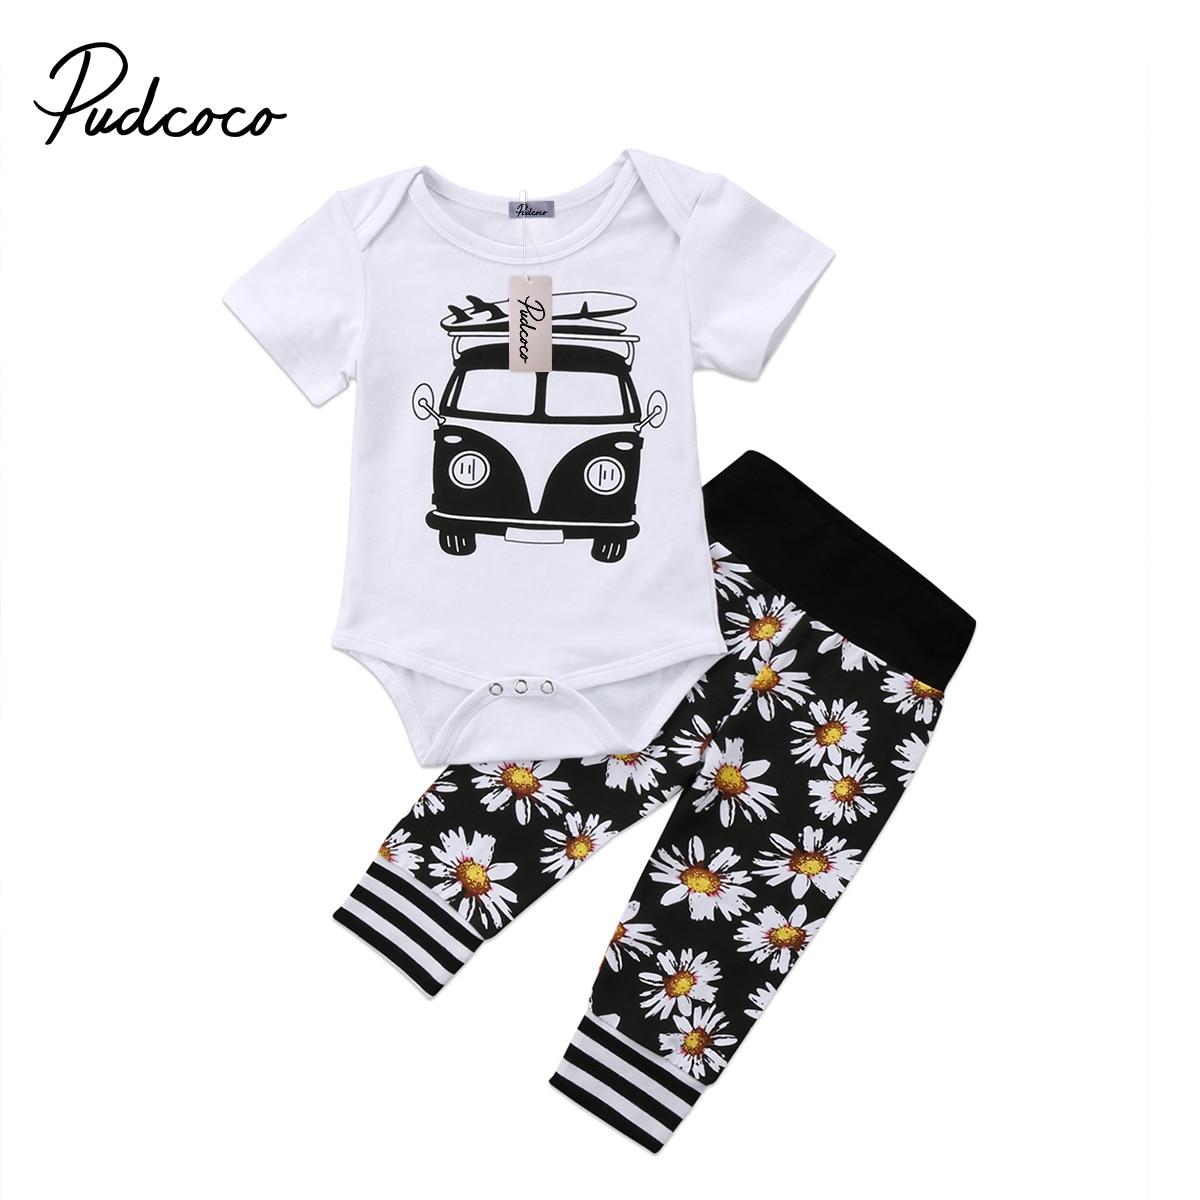 Pudcoco 2Pcs Newborn Baby Boy Girls Clothes Car Printed Bodysuit Sunflower Pants Outfits Set 6-24Months Helen115